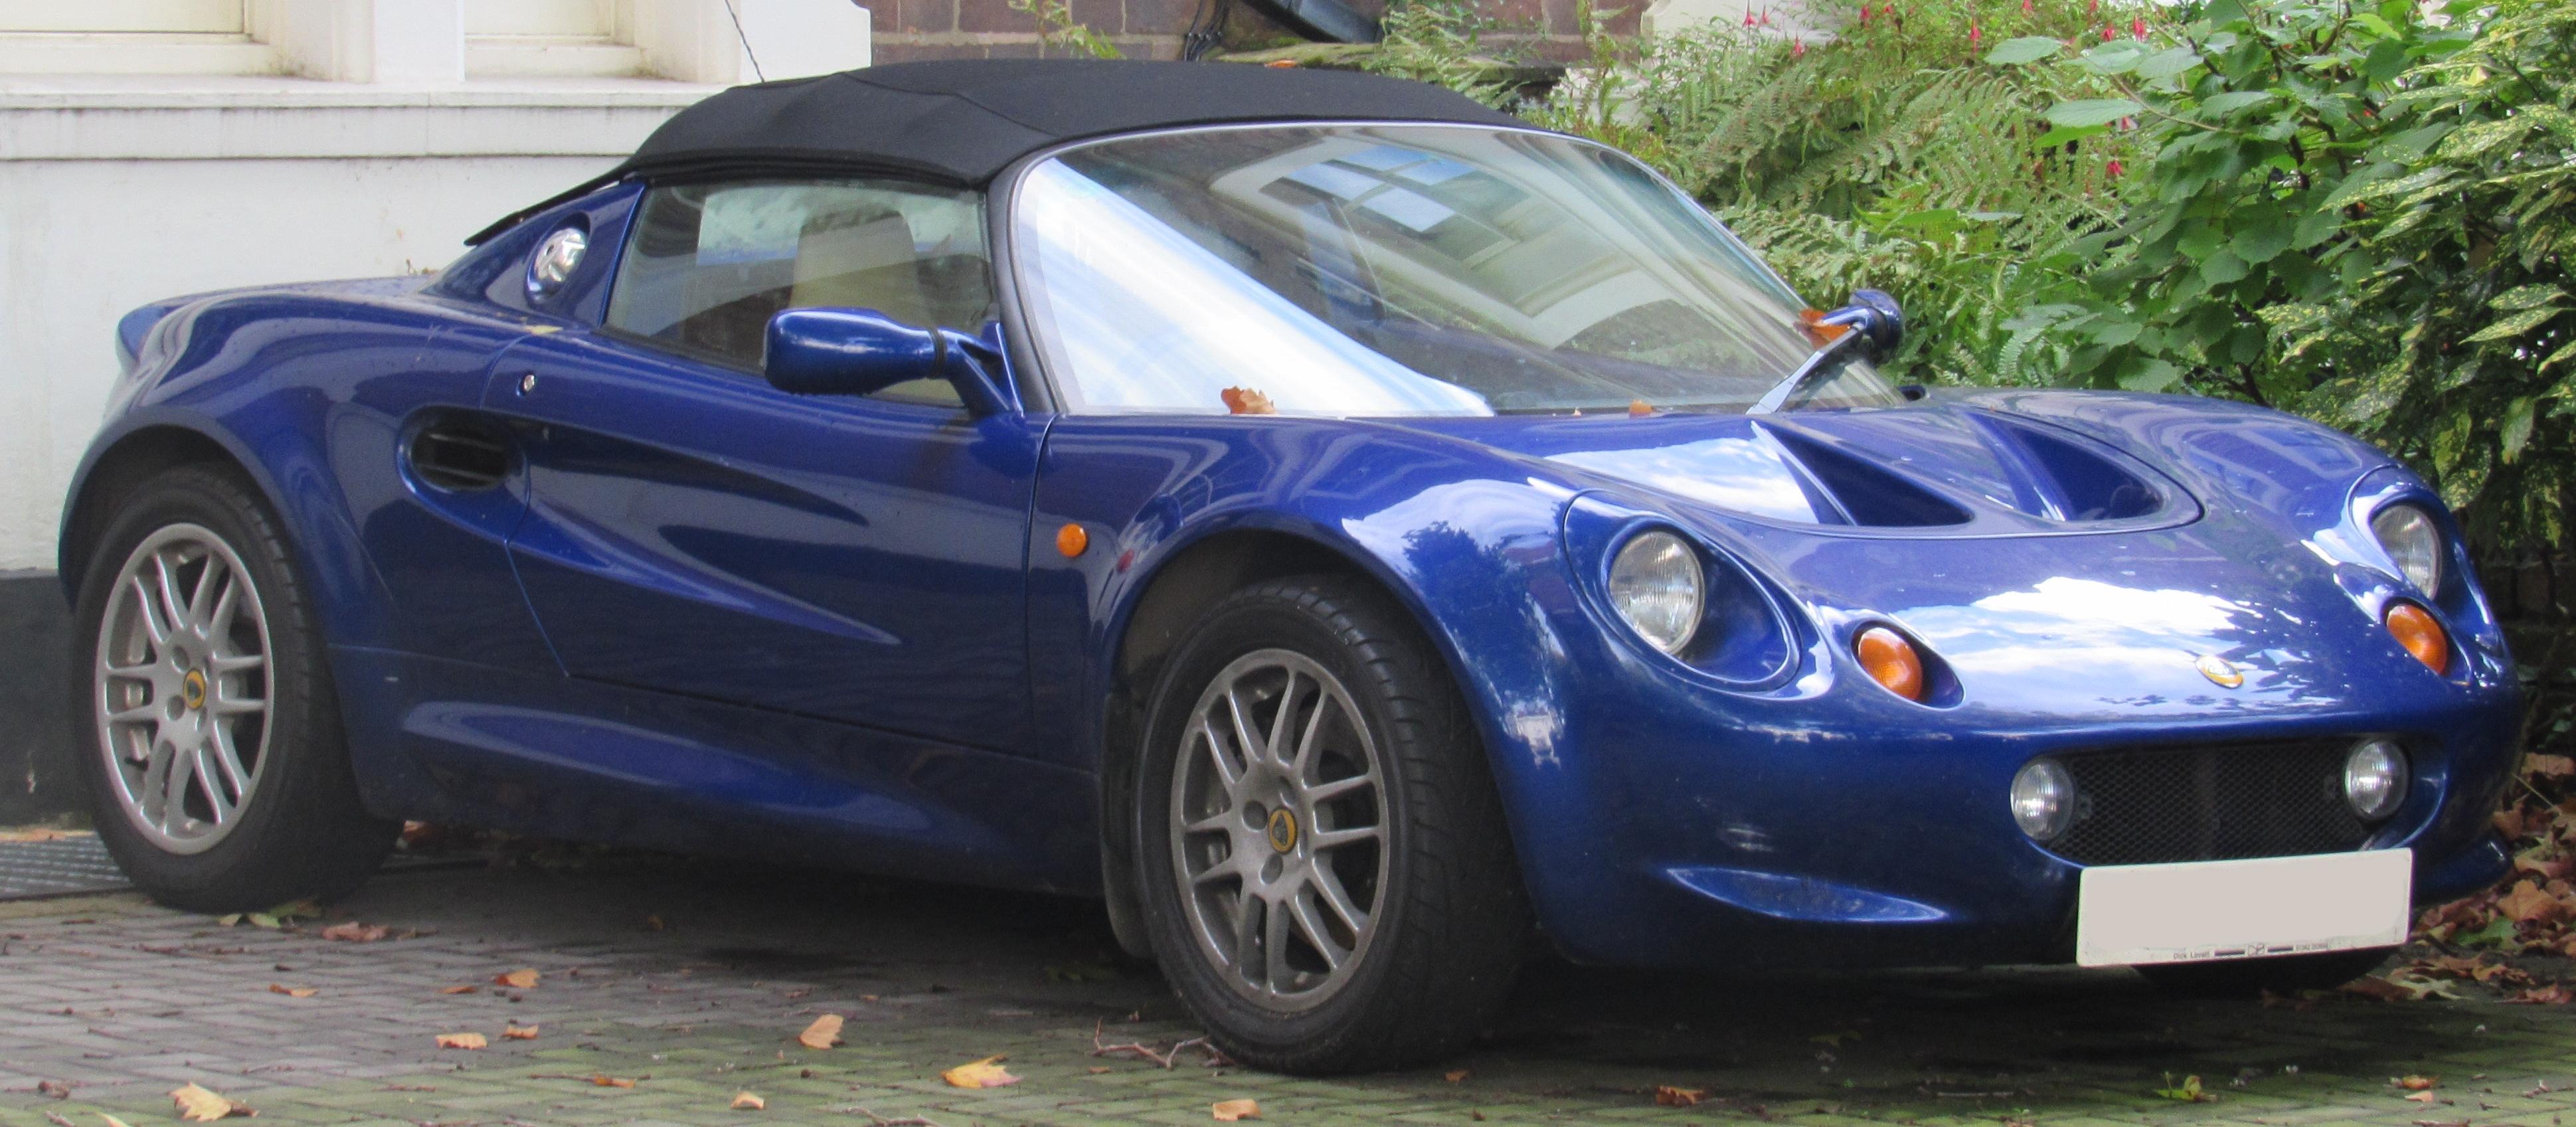 File:1999 Lotus Elise 1.8.jpg - Wikimedia Commons